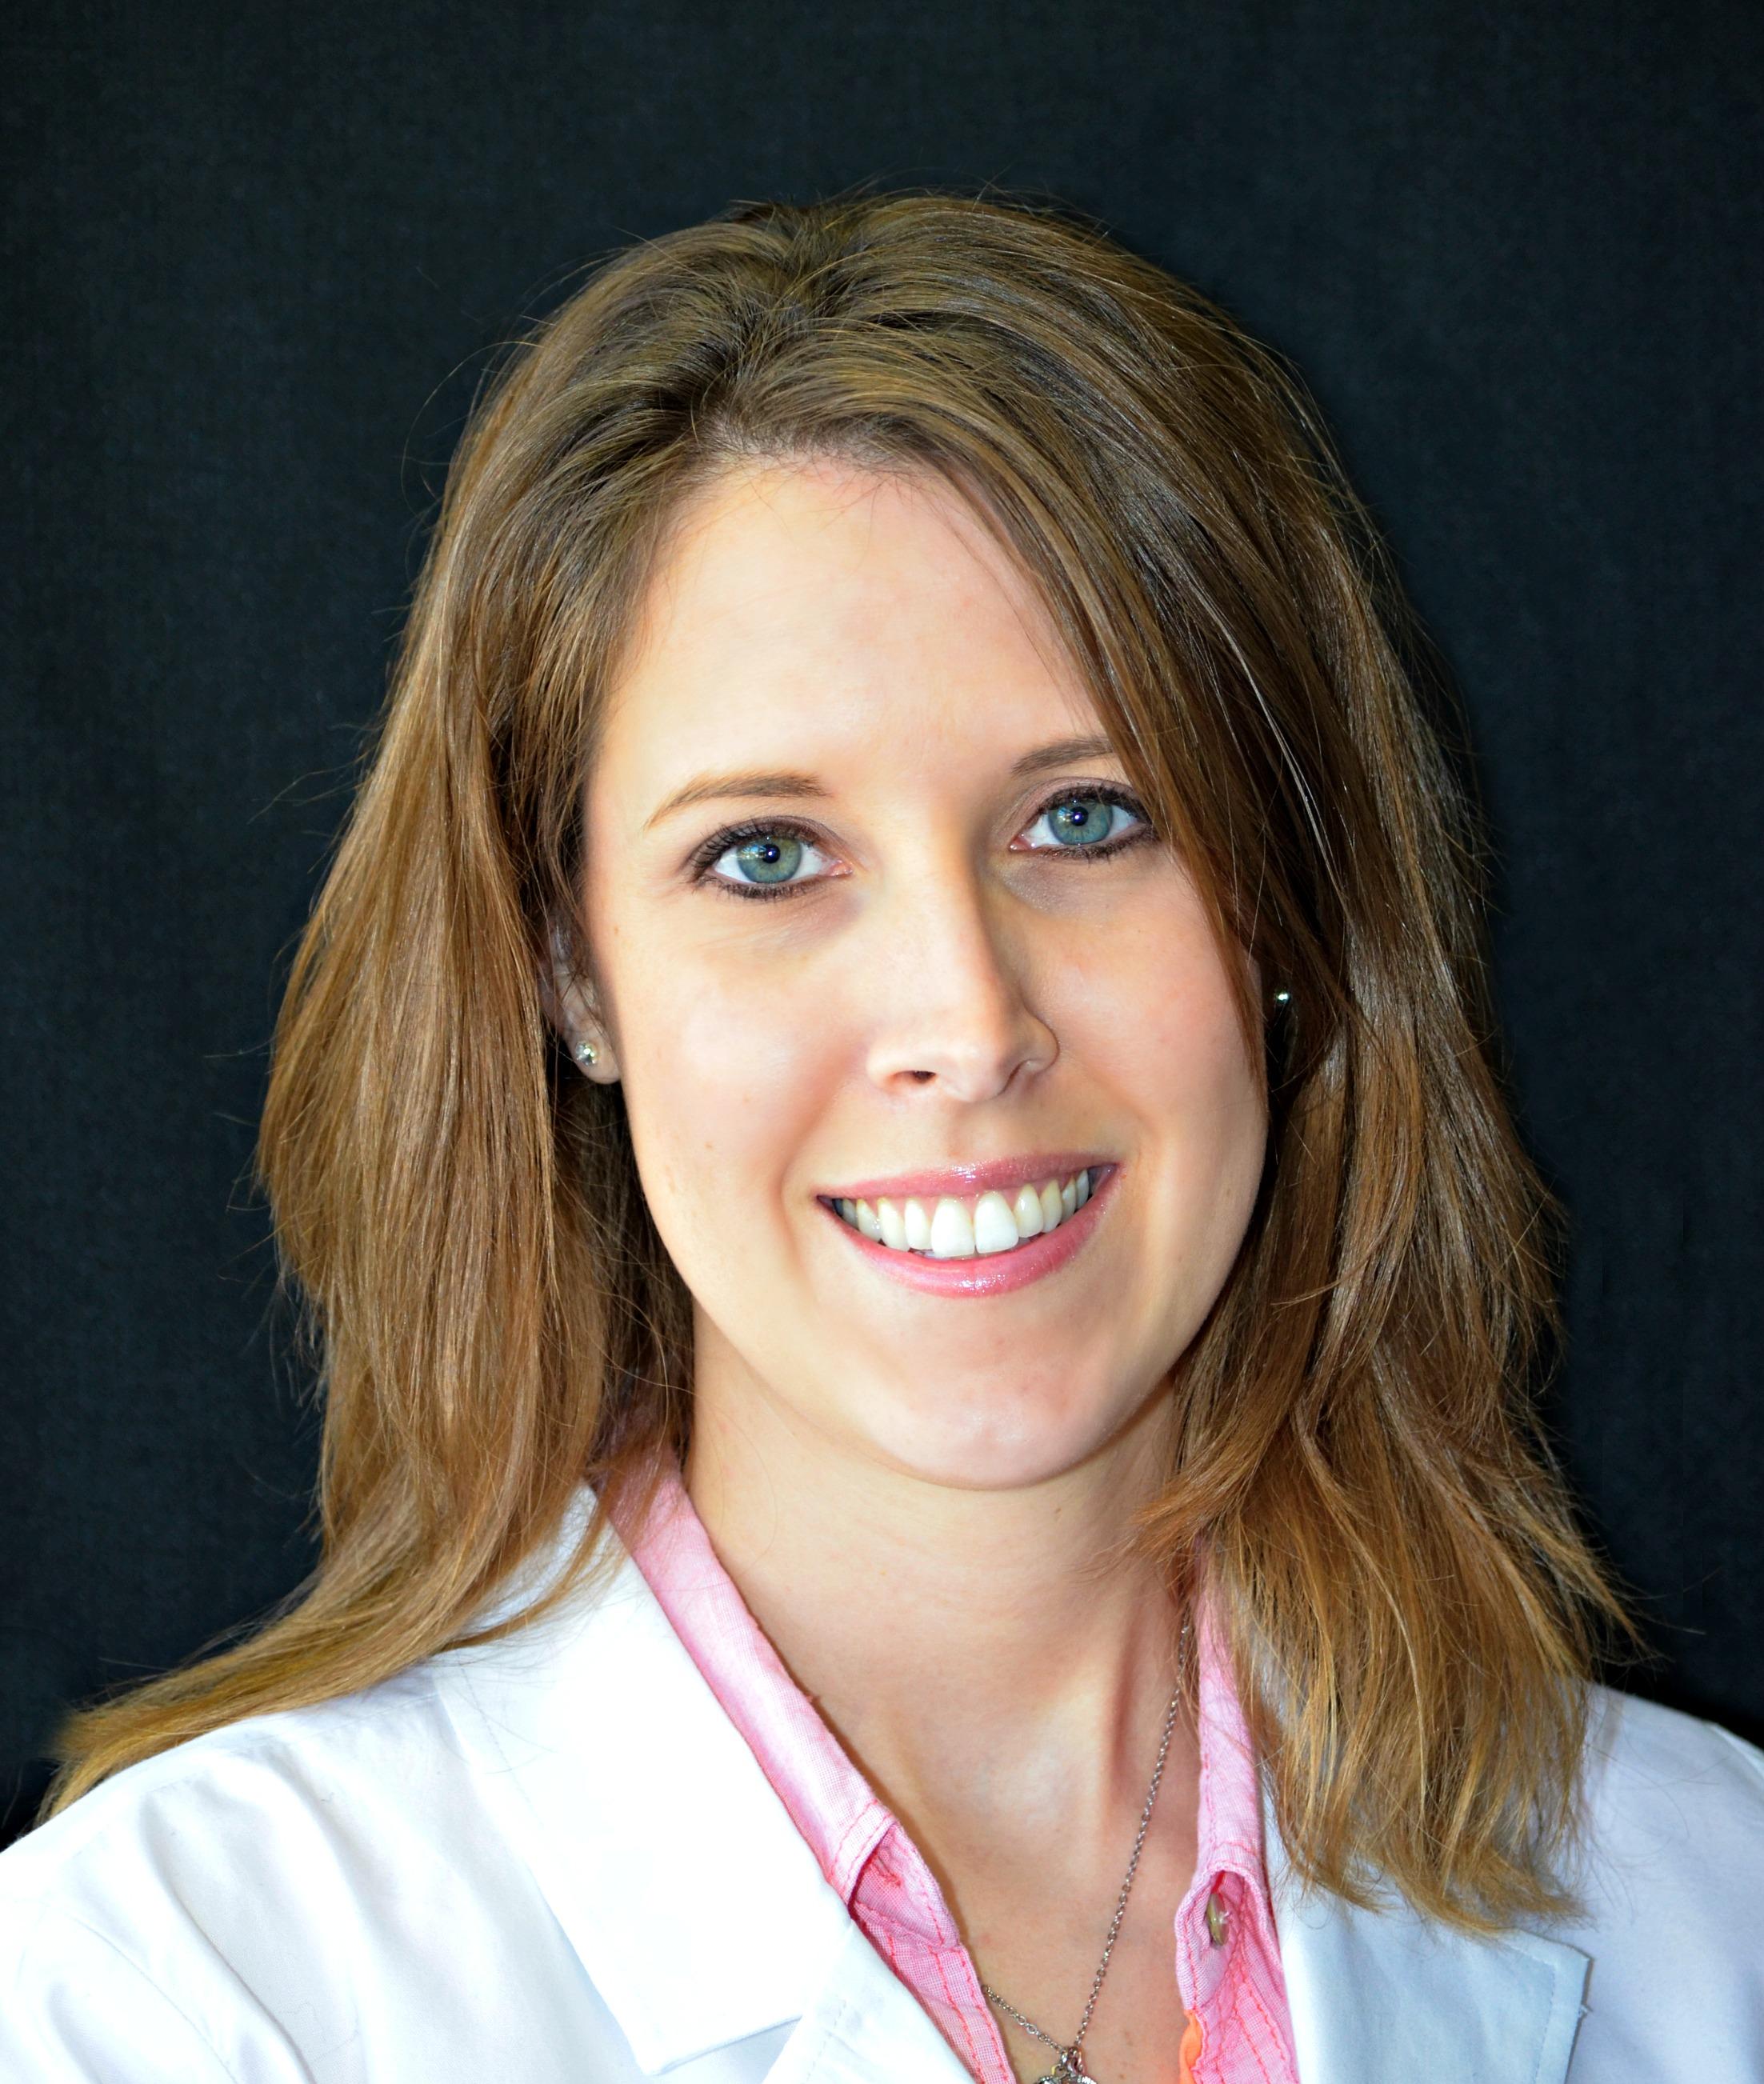 Candace Wren, Family Nurse Practitioner